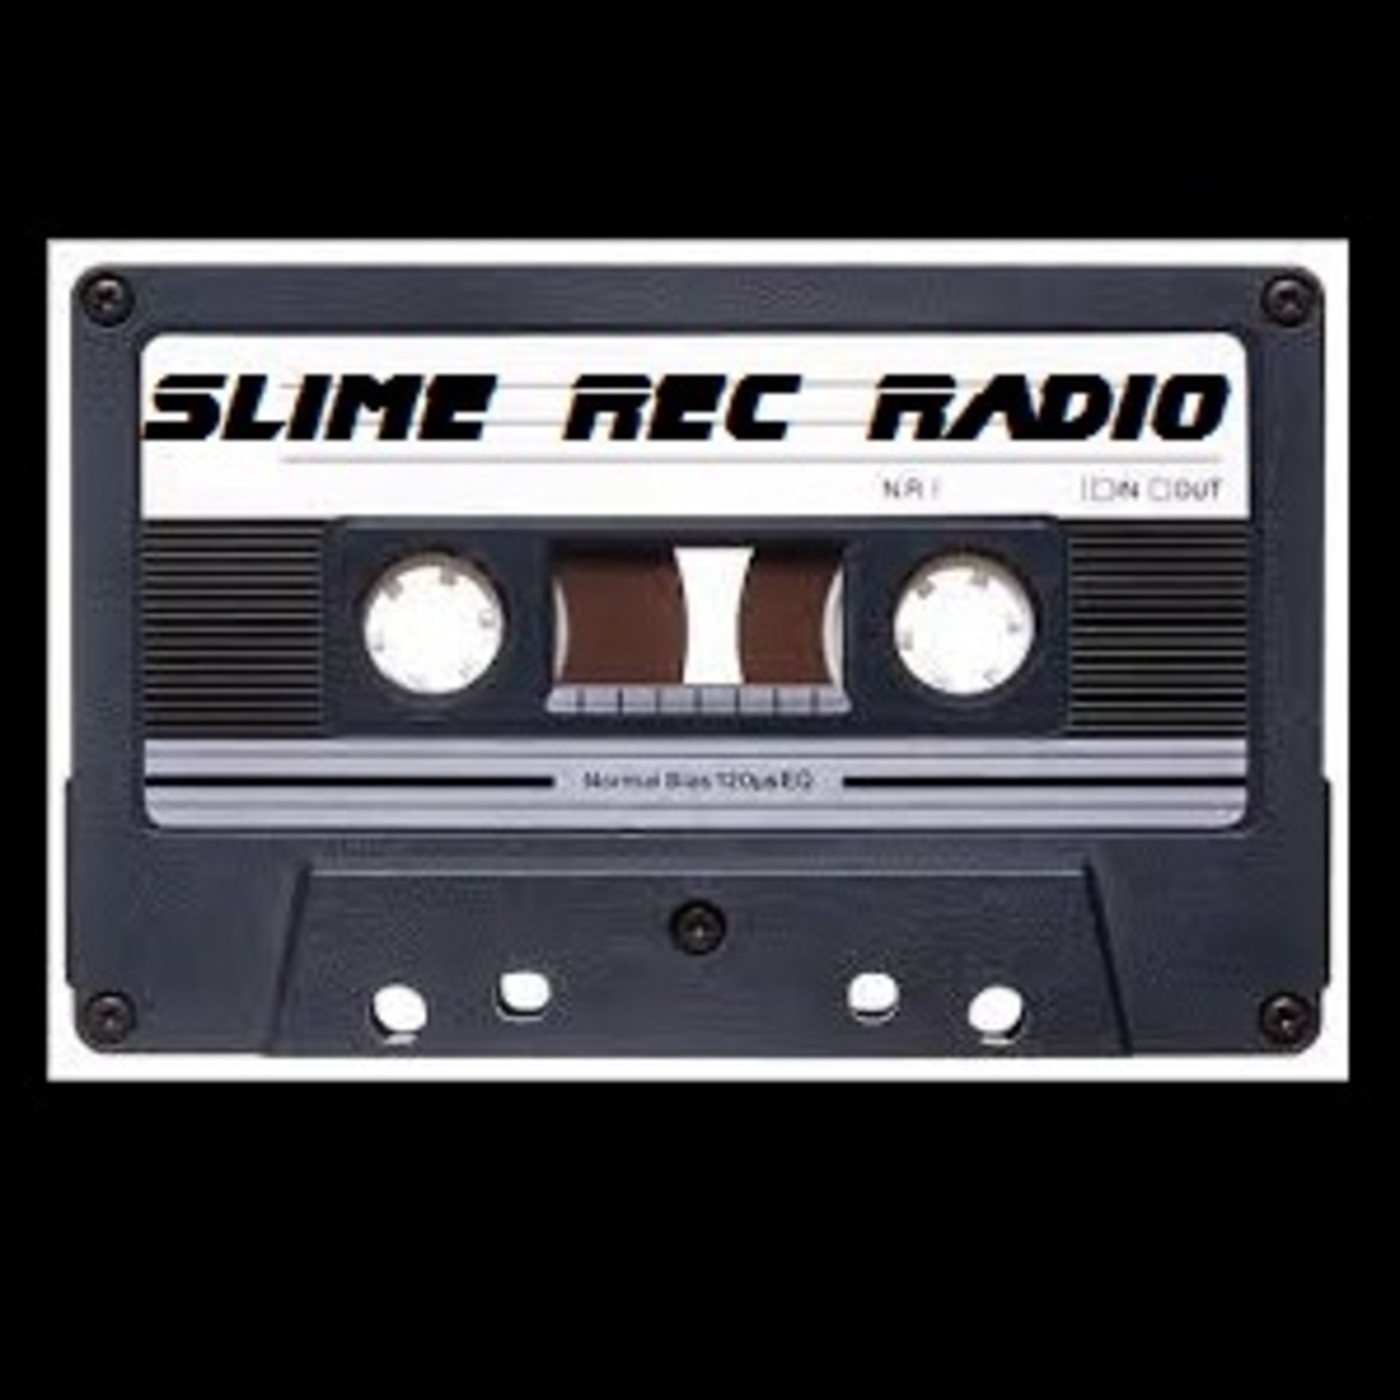 Slime Rec Radio